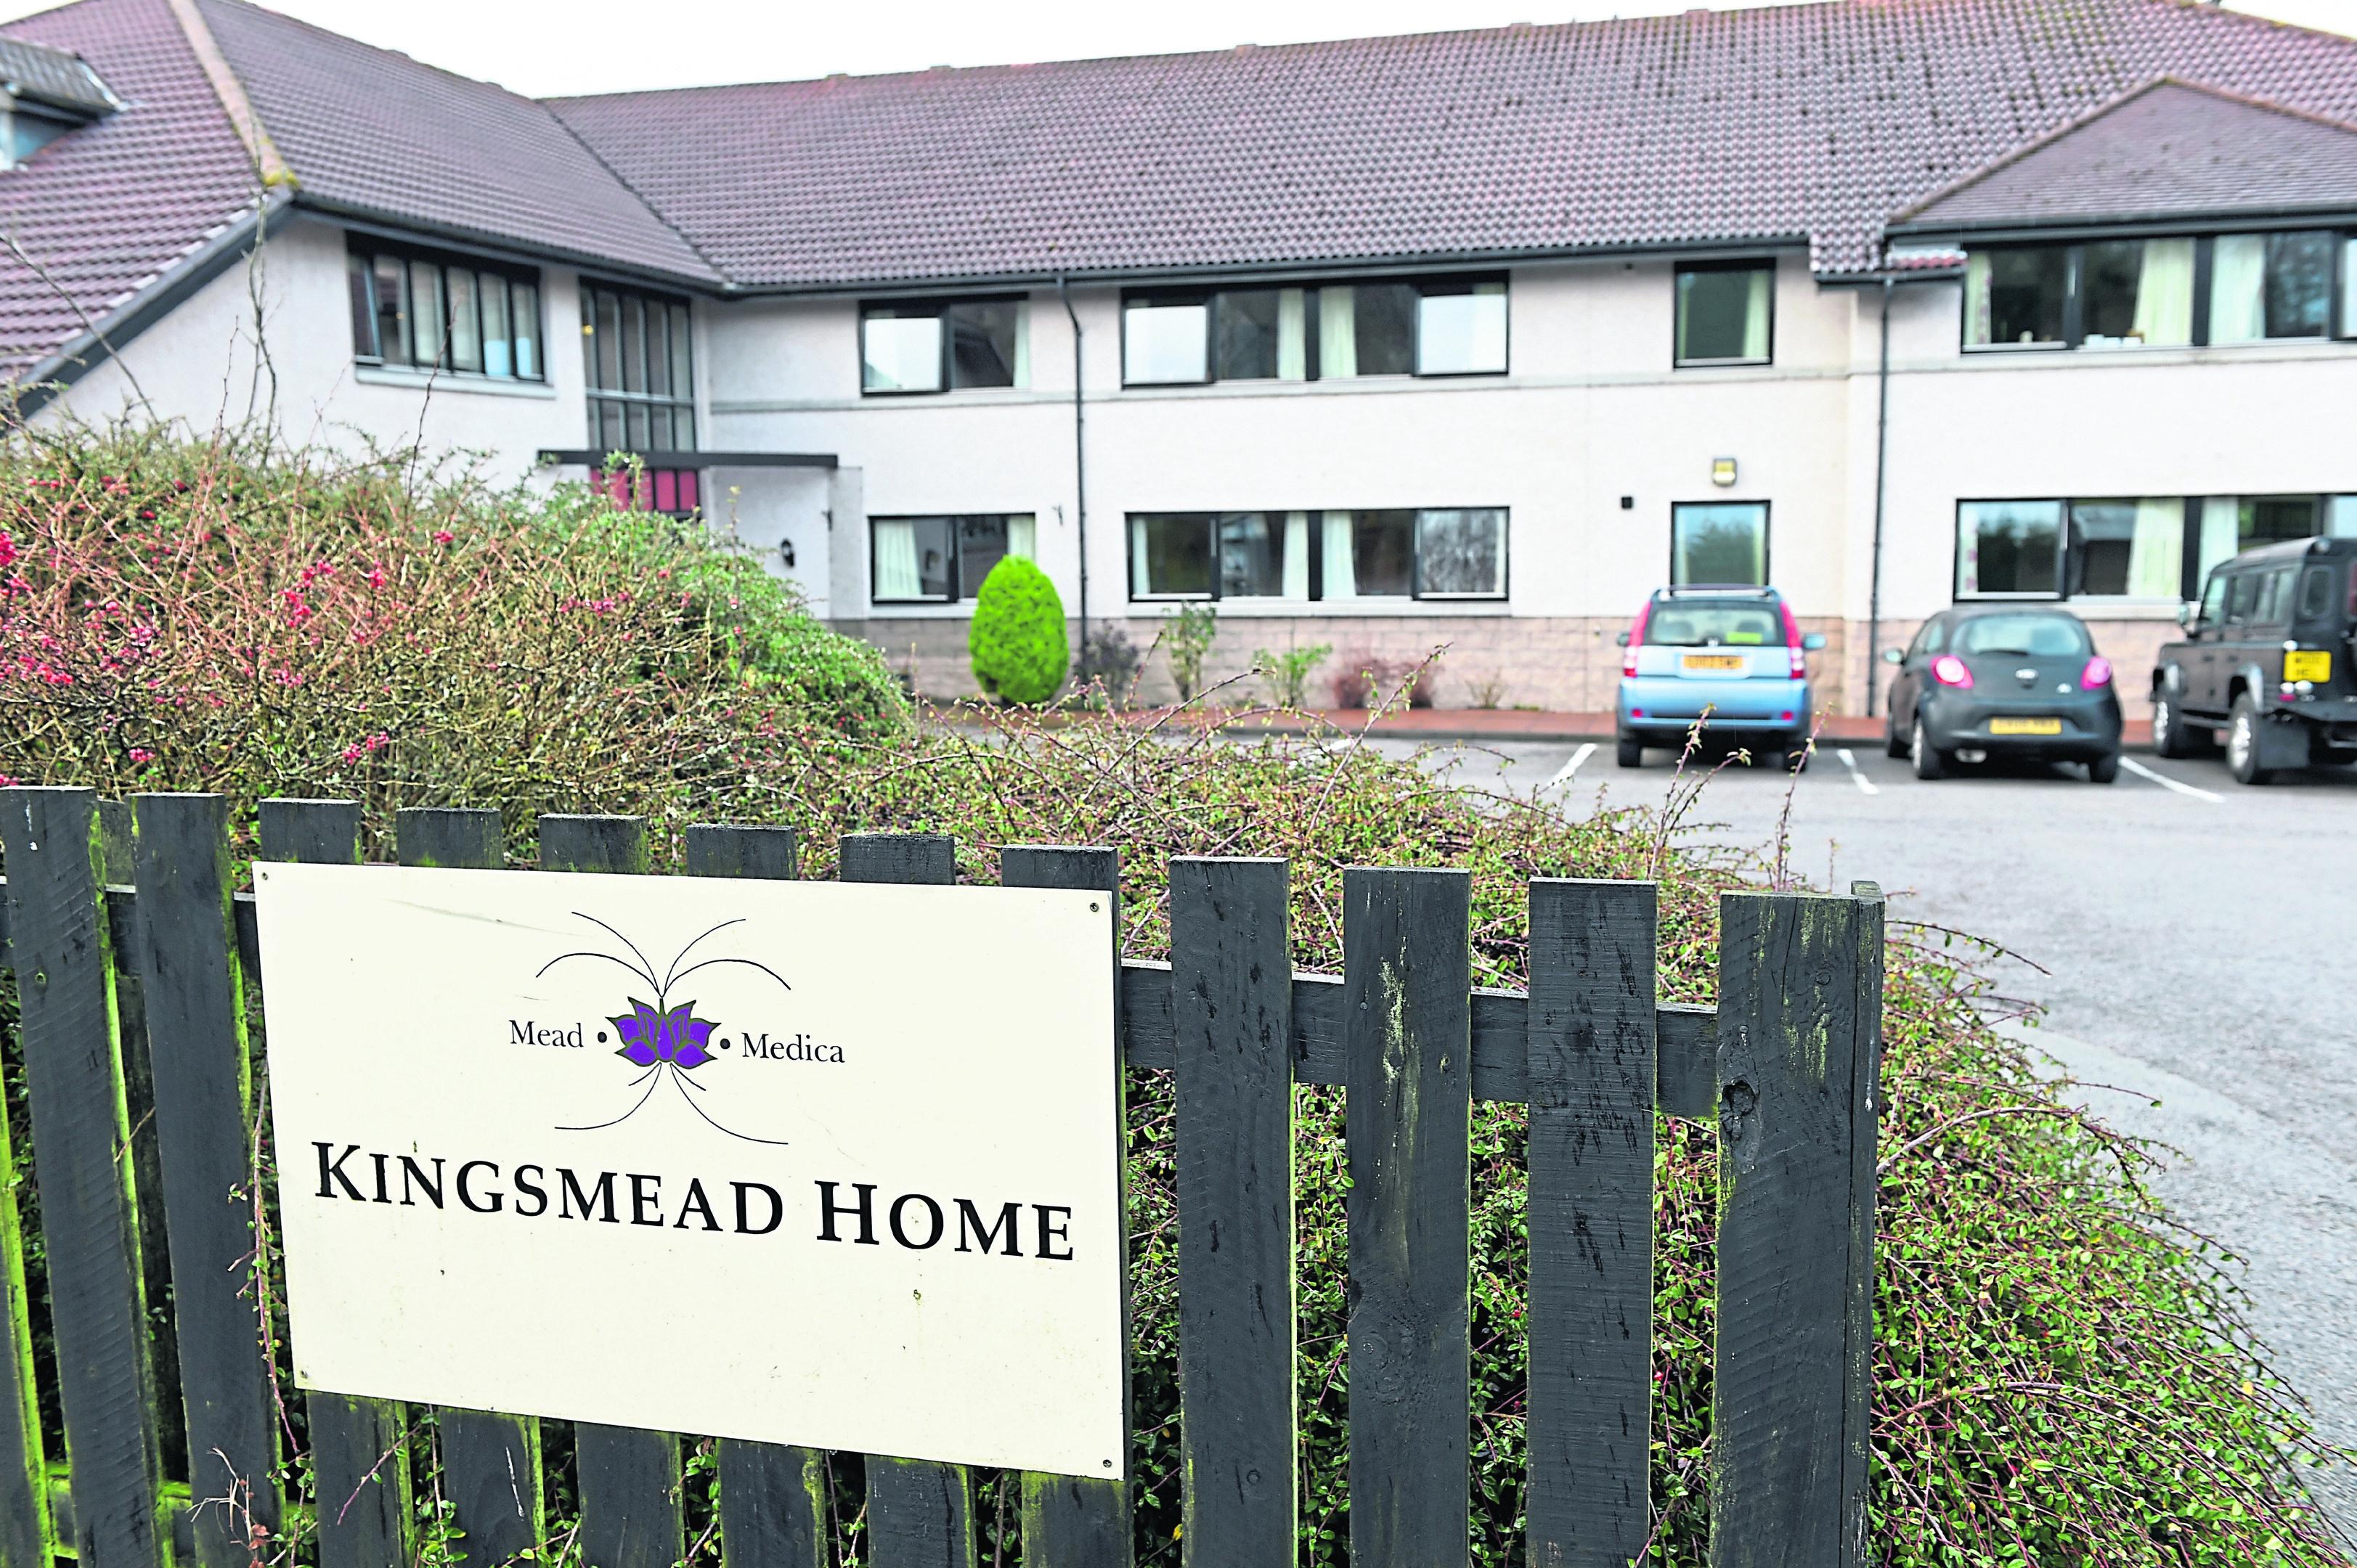 Kingsmead Care Home in Kingswells.